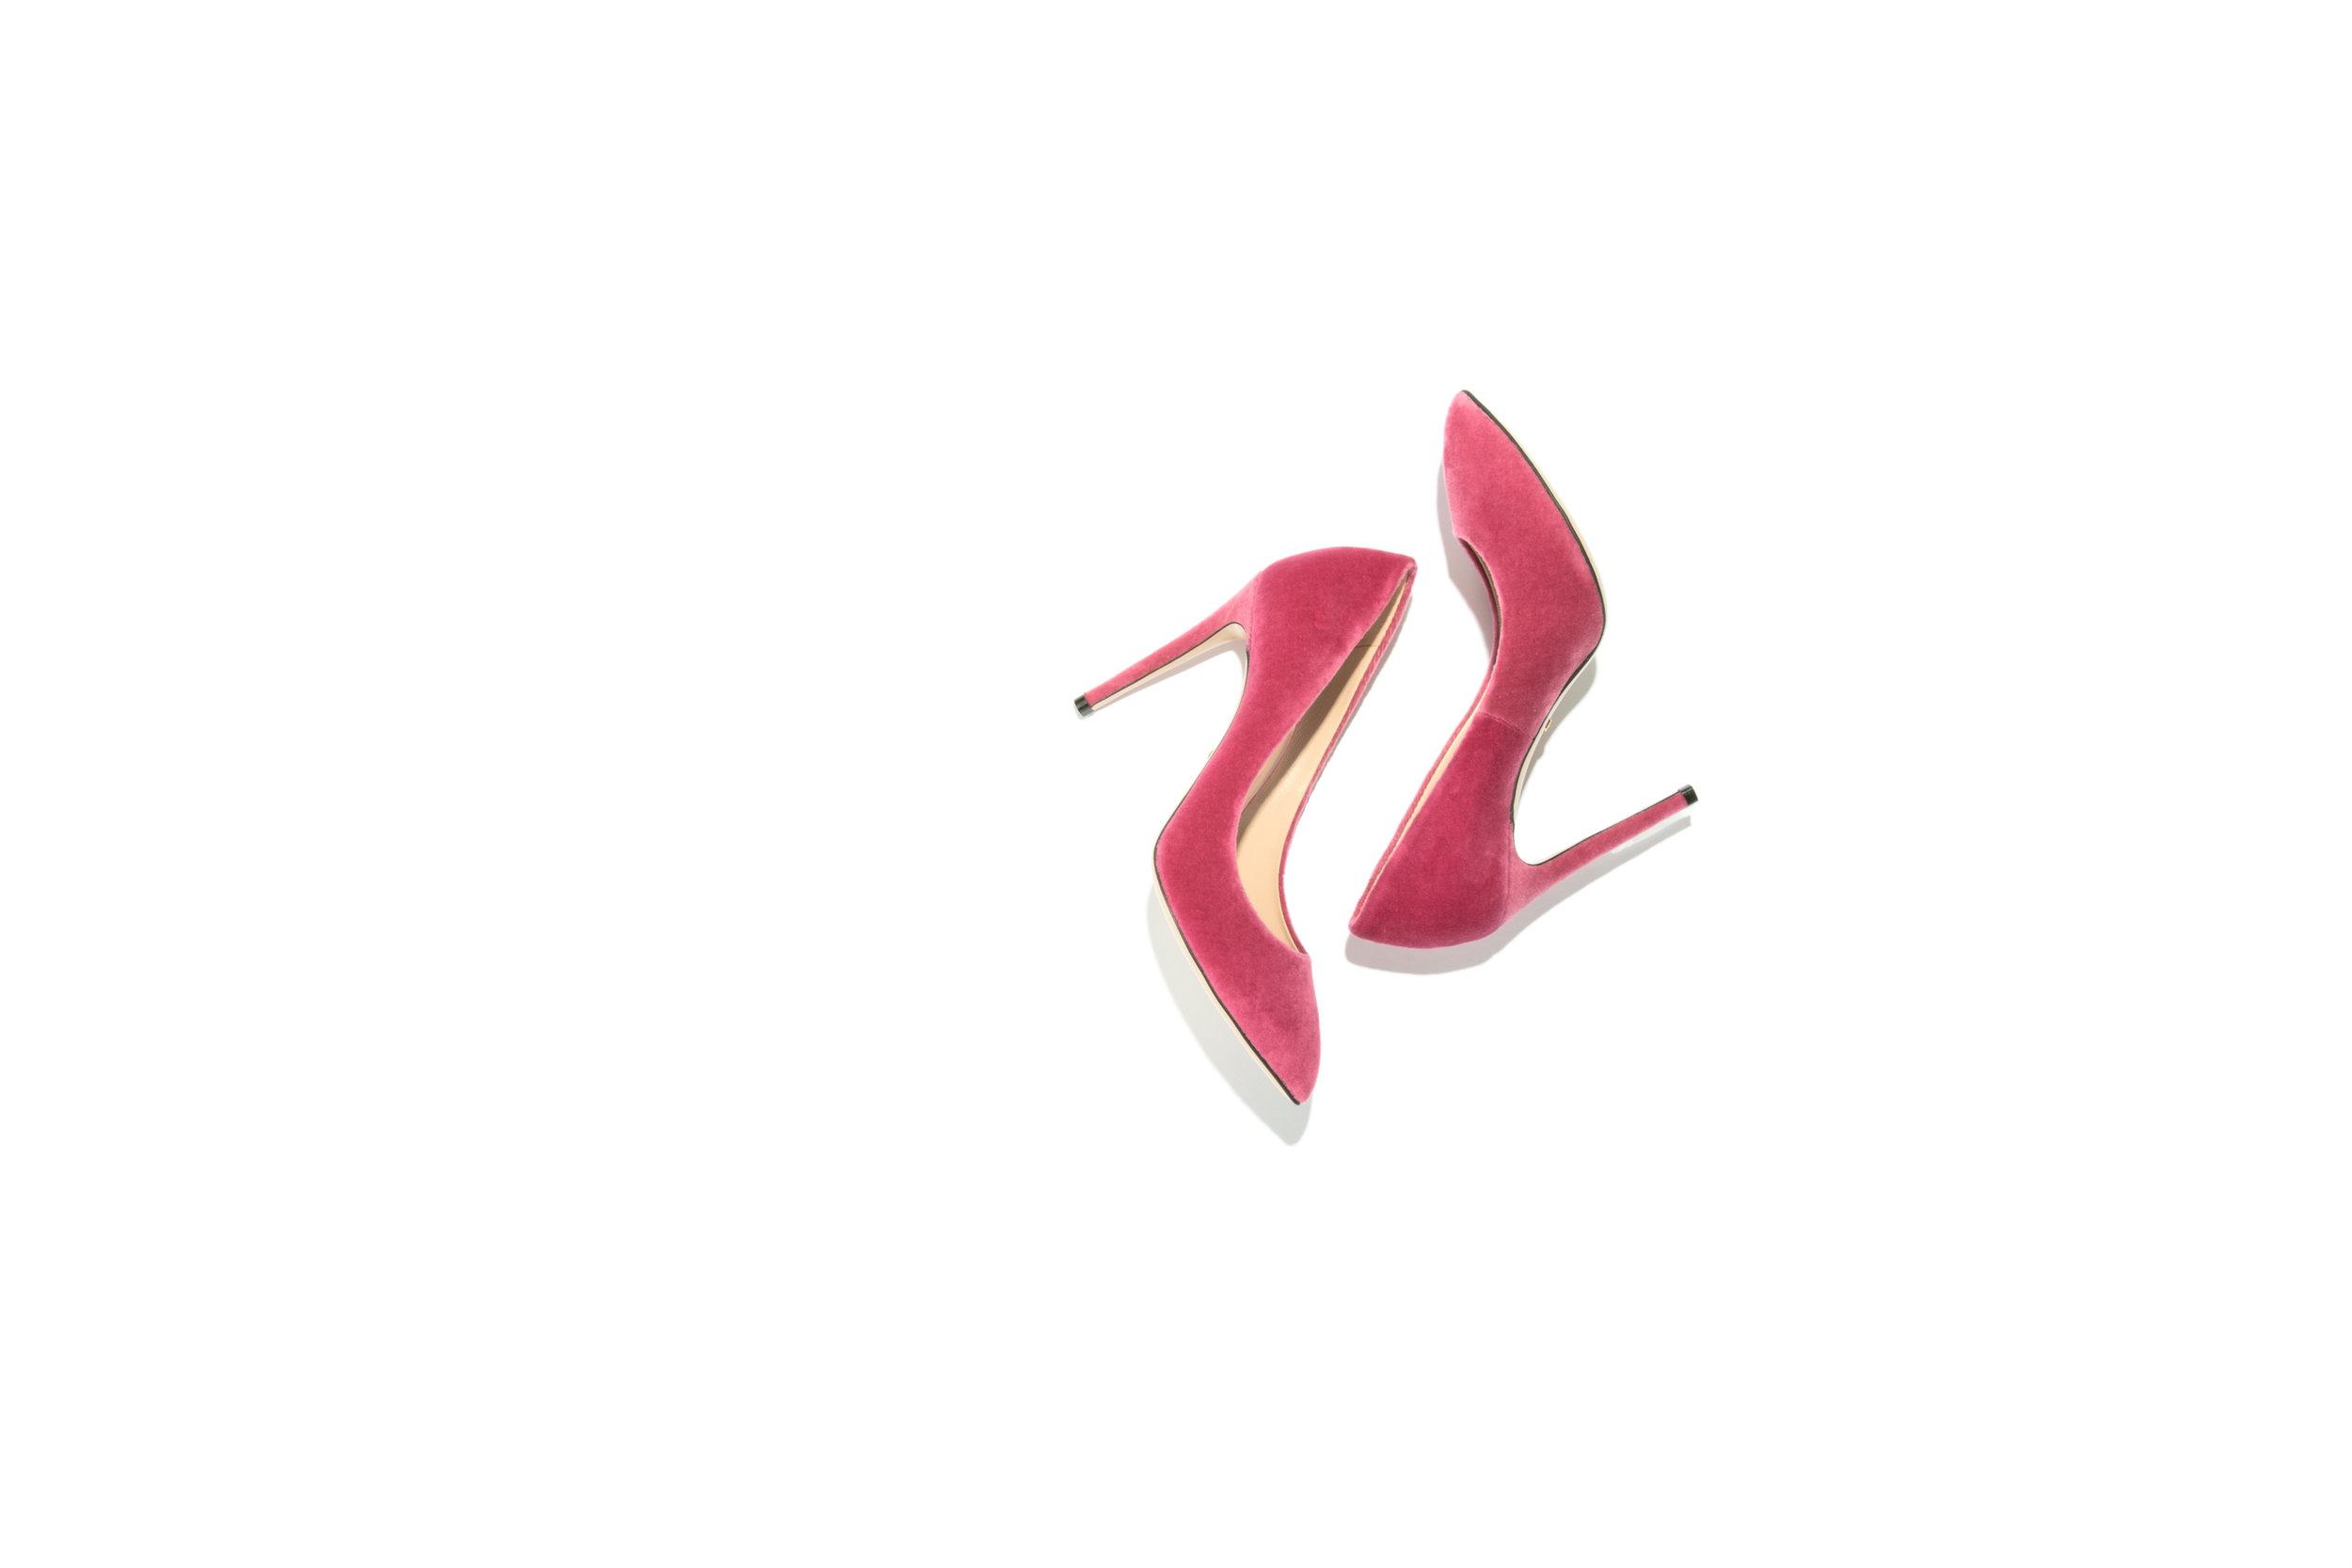 DinaKantor-Products-20.jpg